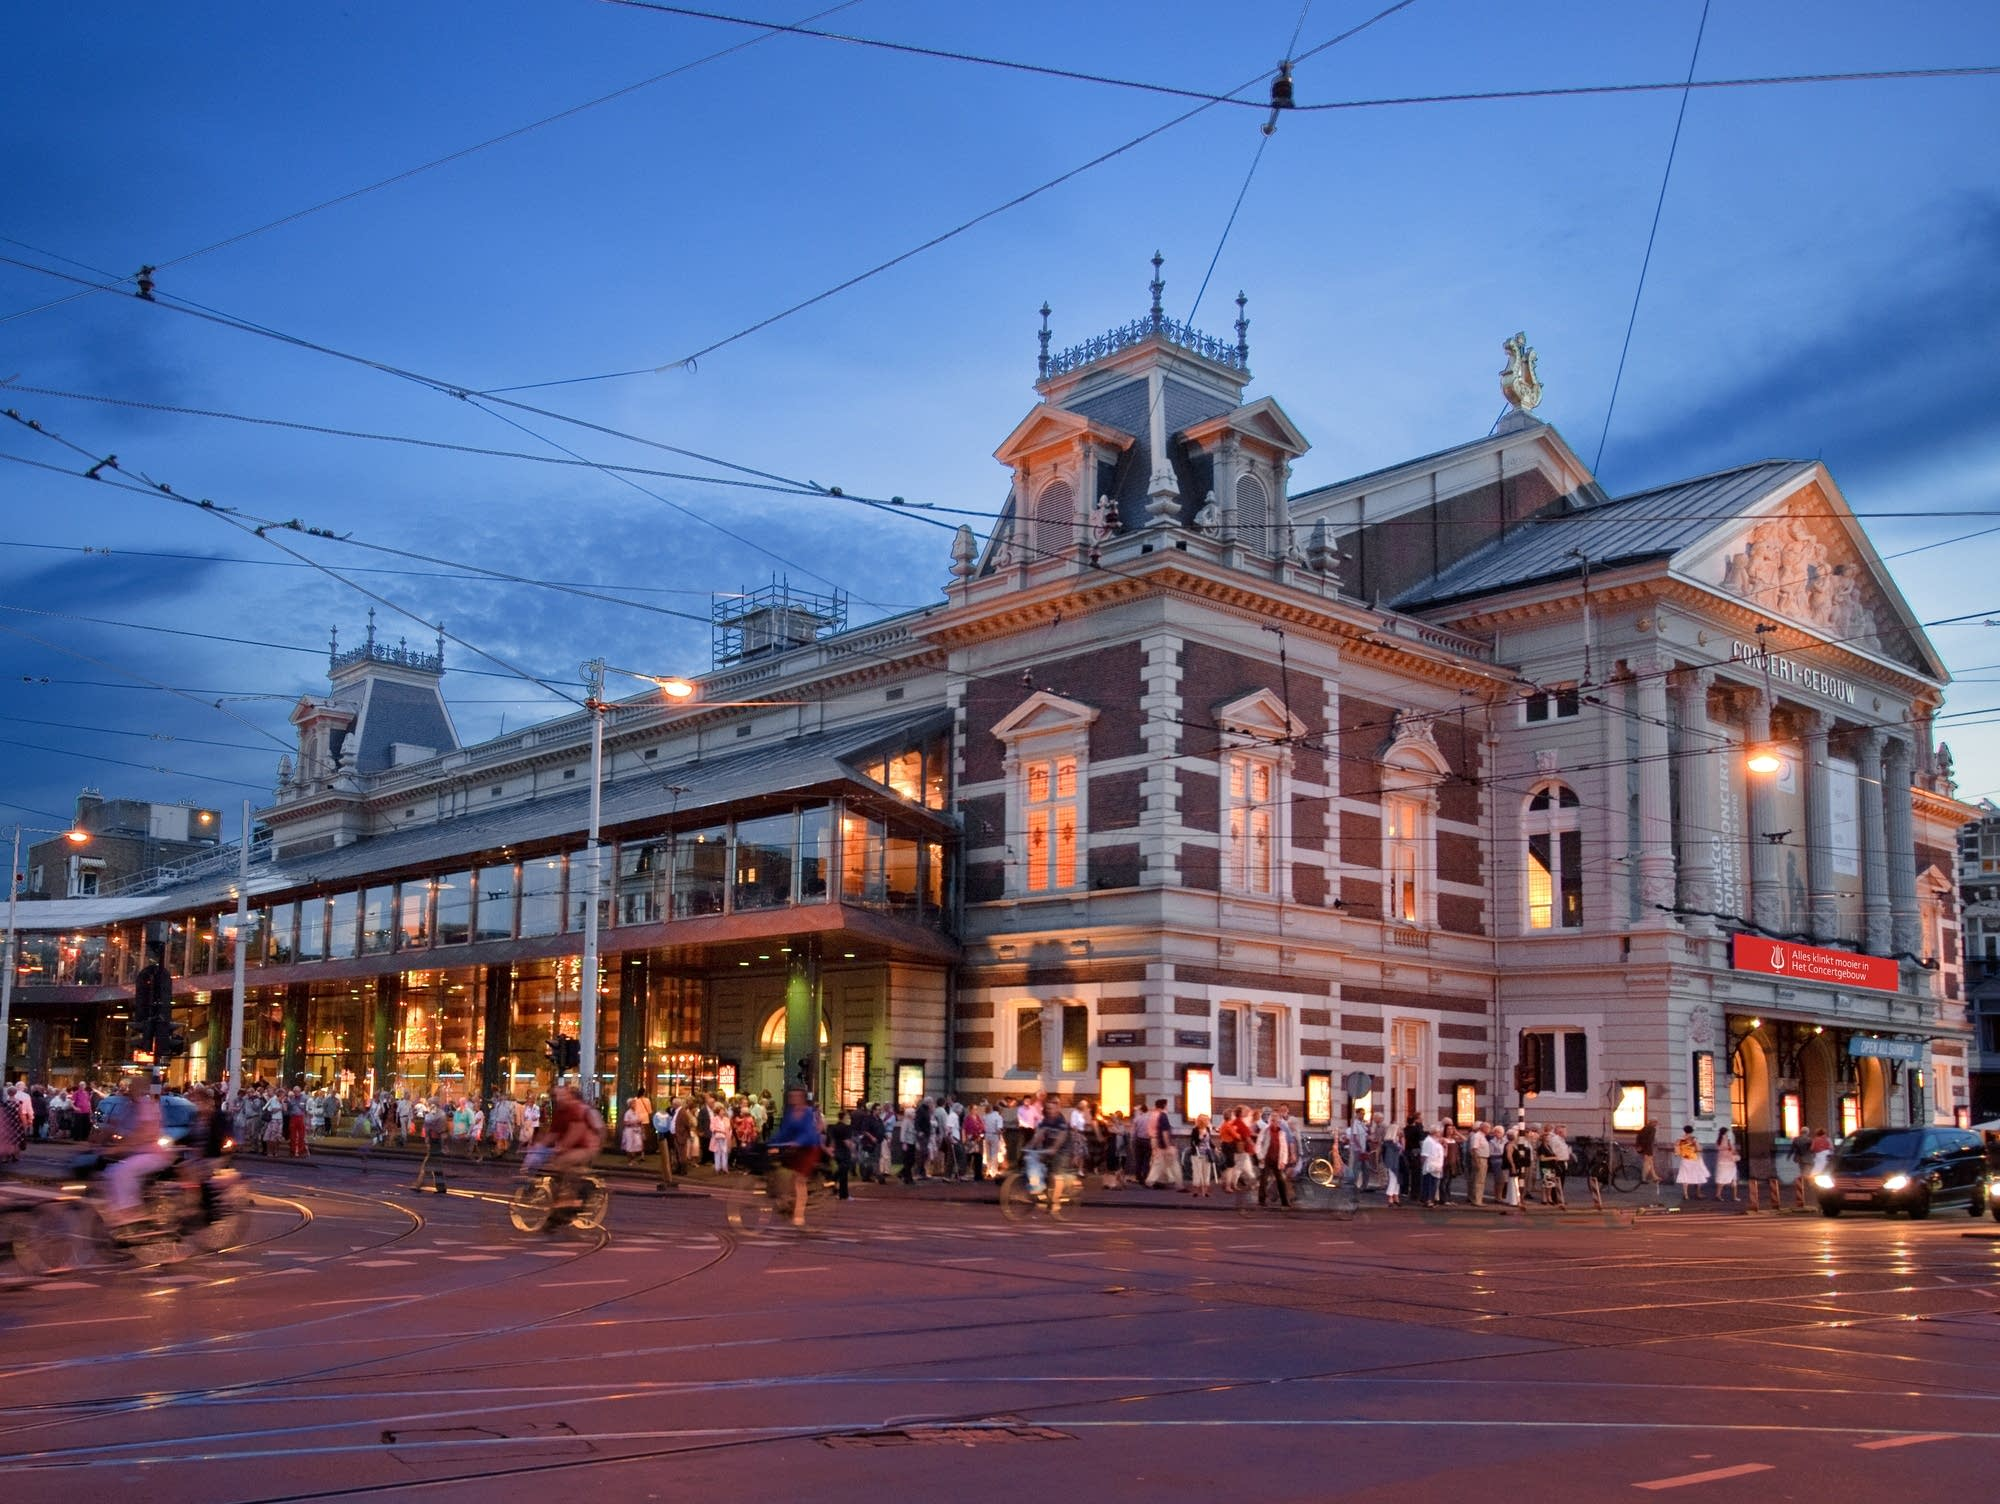 The Concertgebouw in Amsterdam